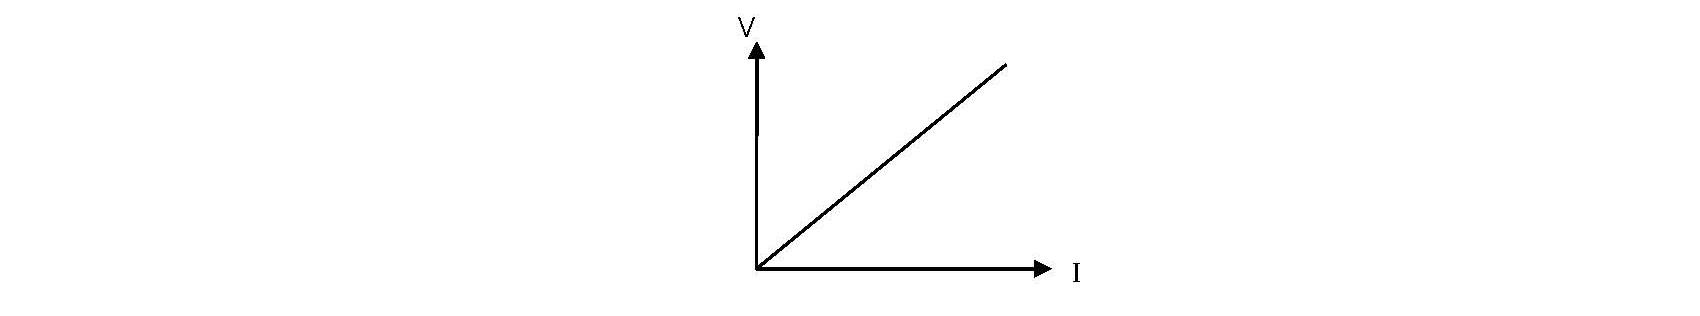 graph of ohmic conductors